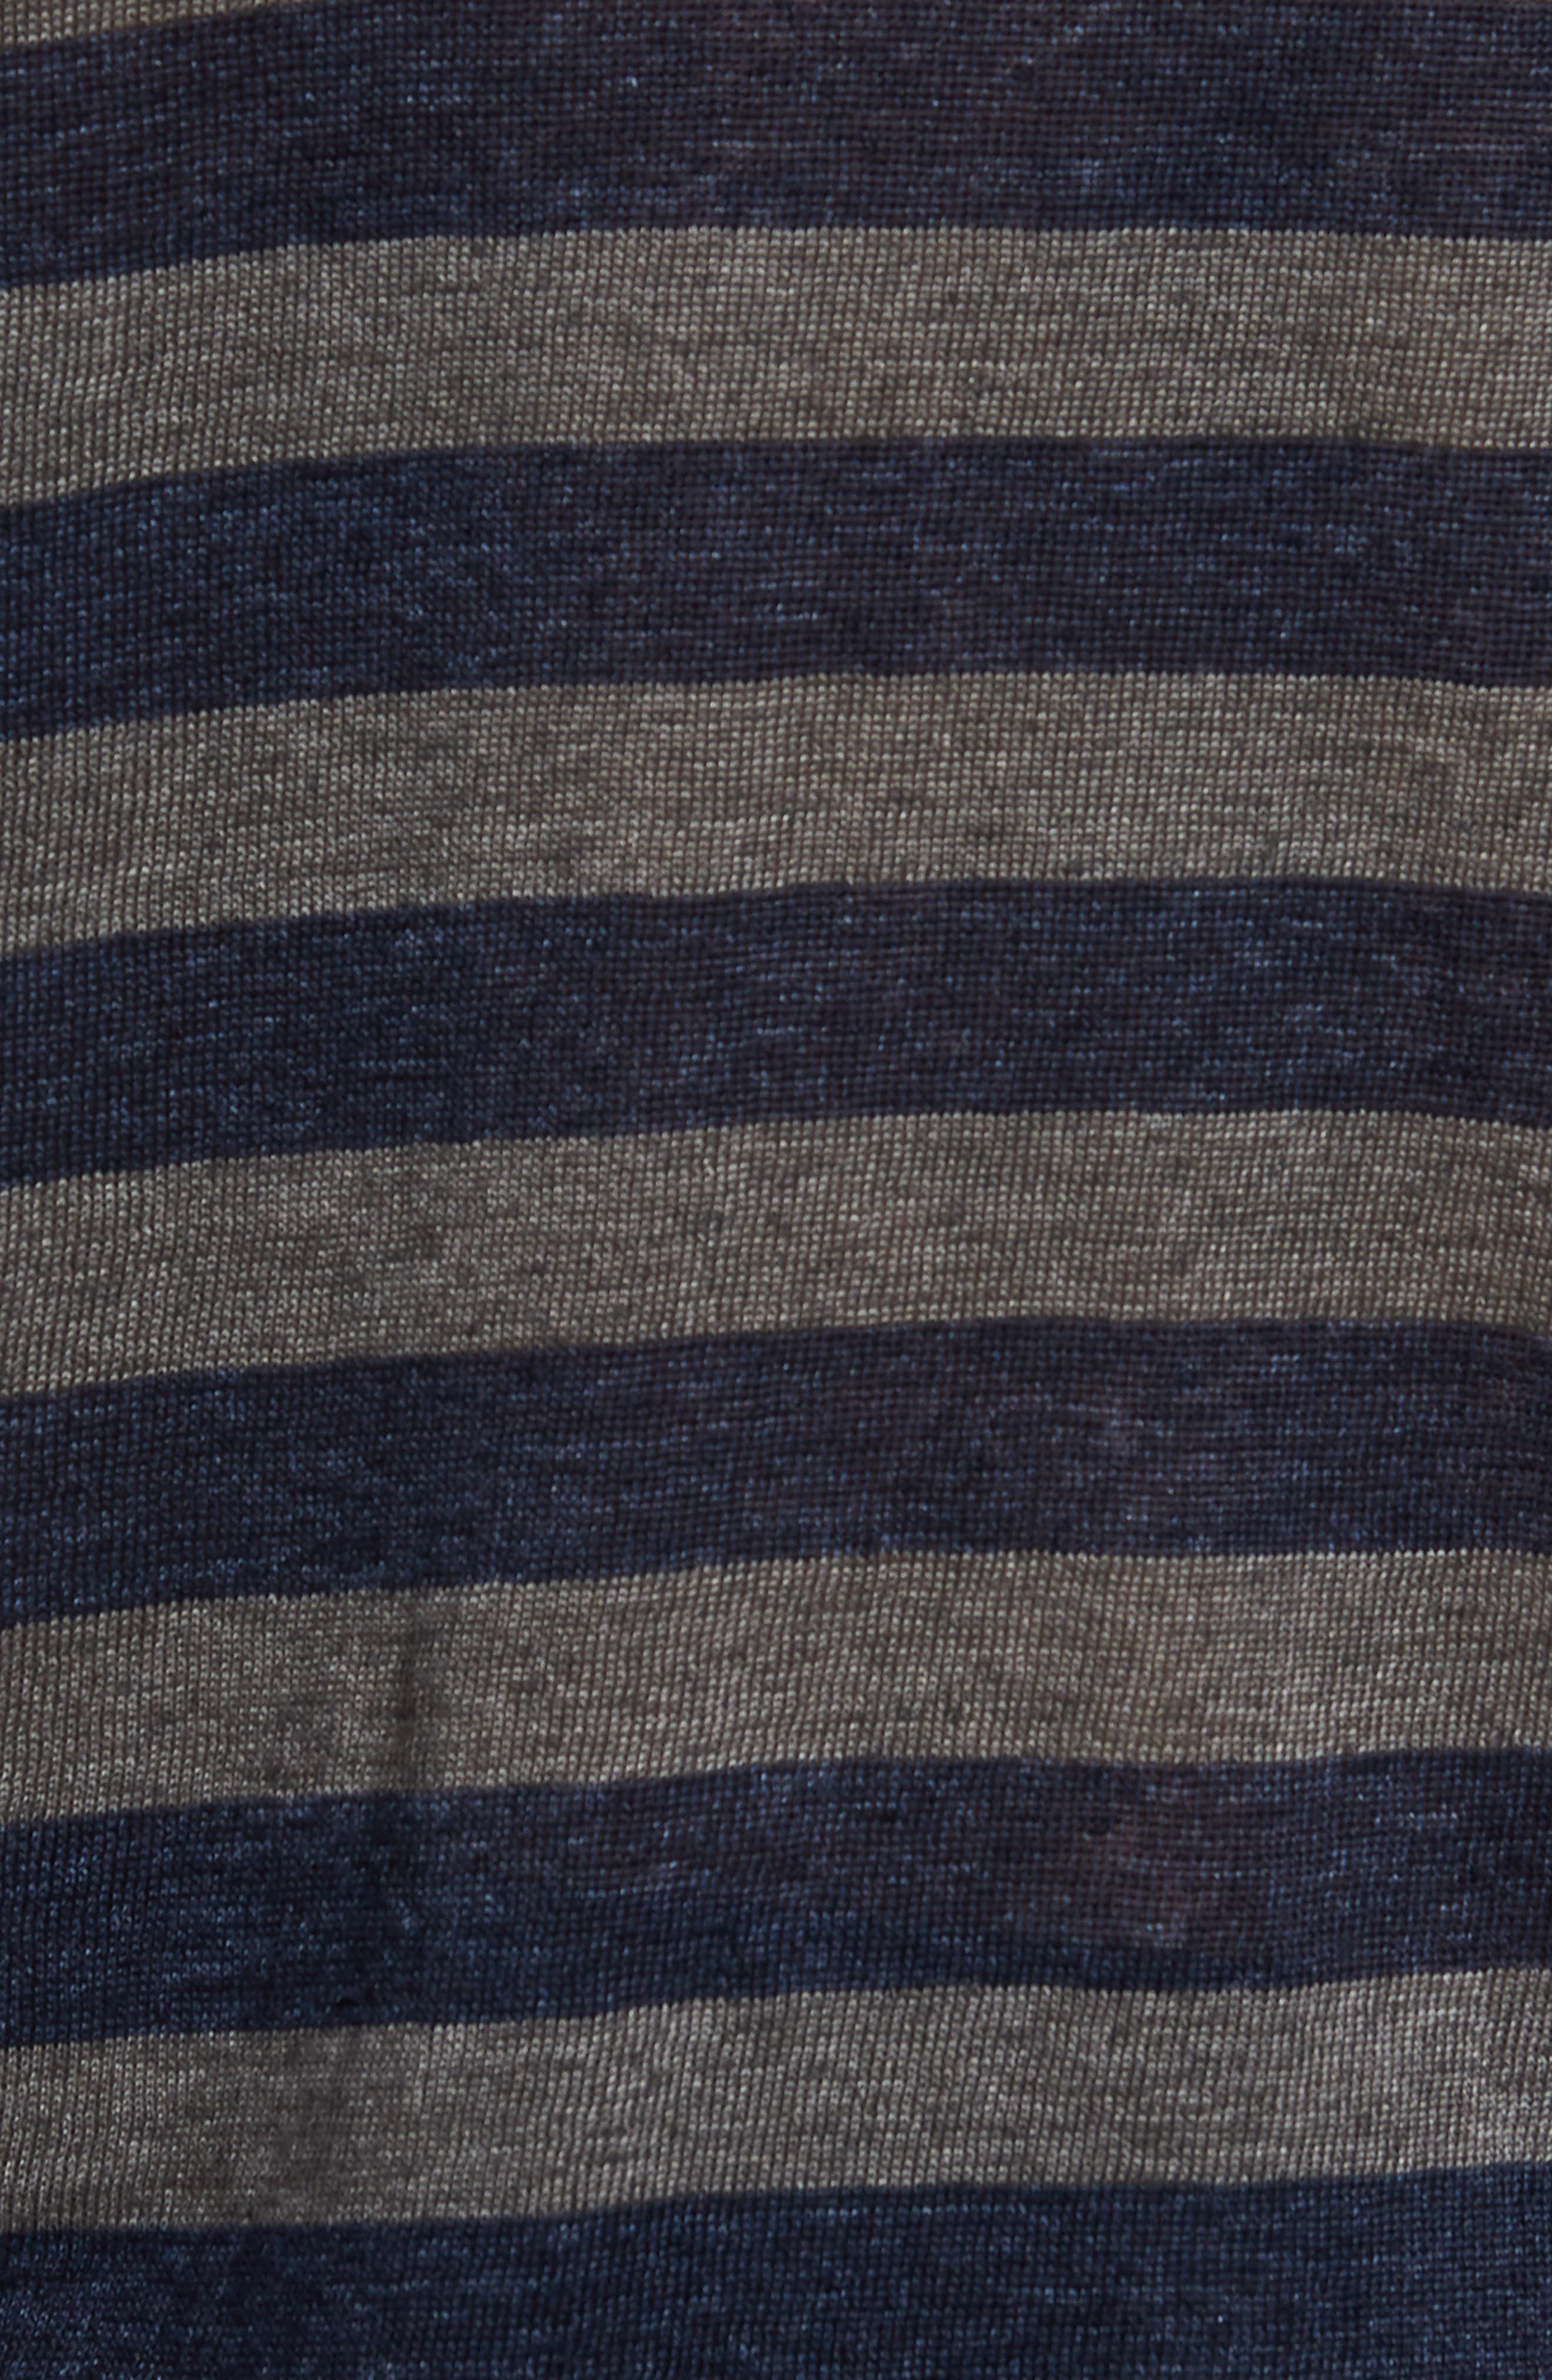 & Bros. Stripe Linen Sweater,                             Alternate thumbnail 5, color,